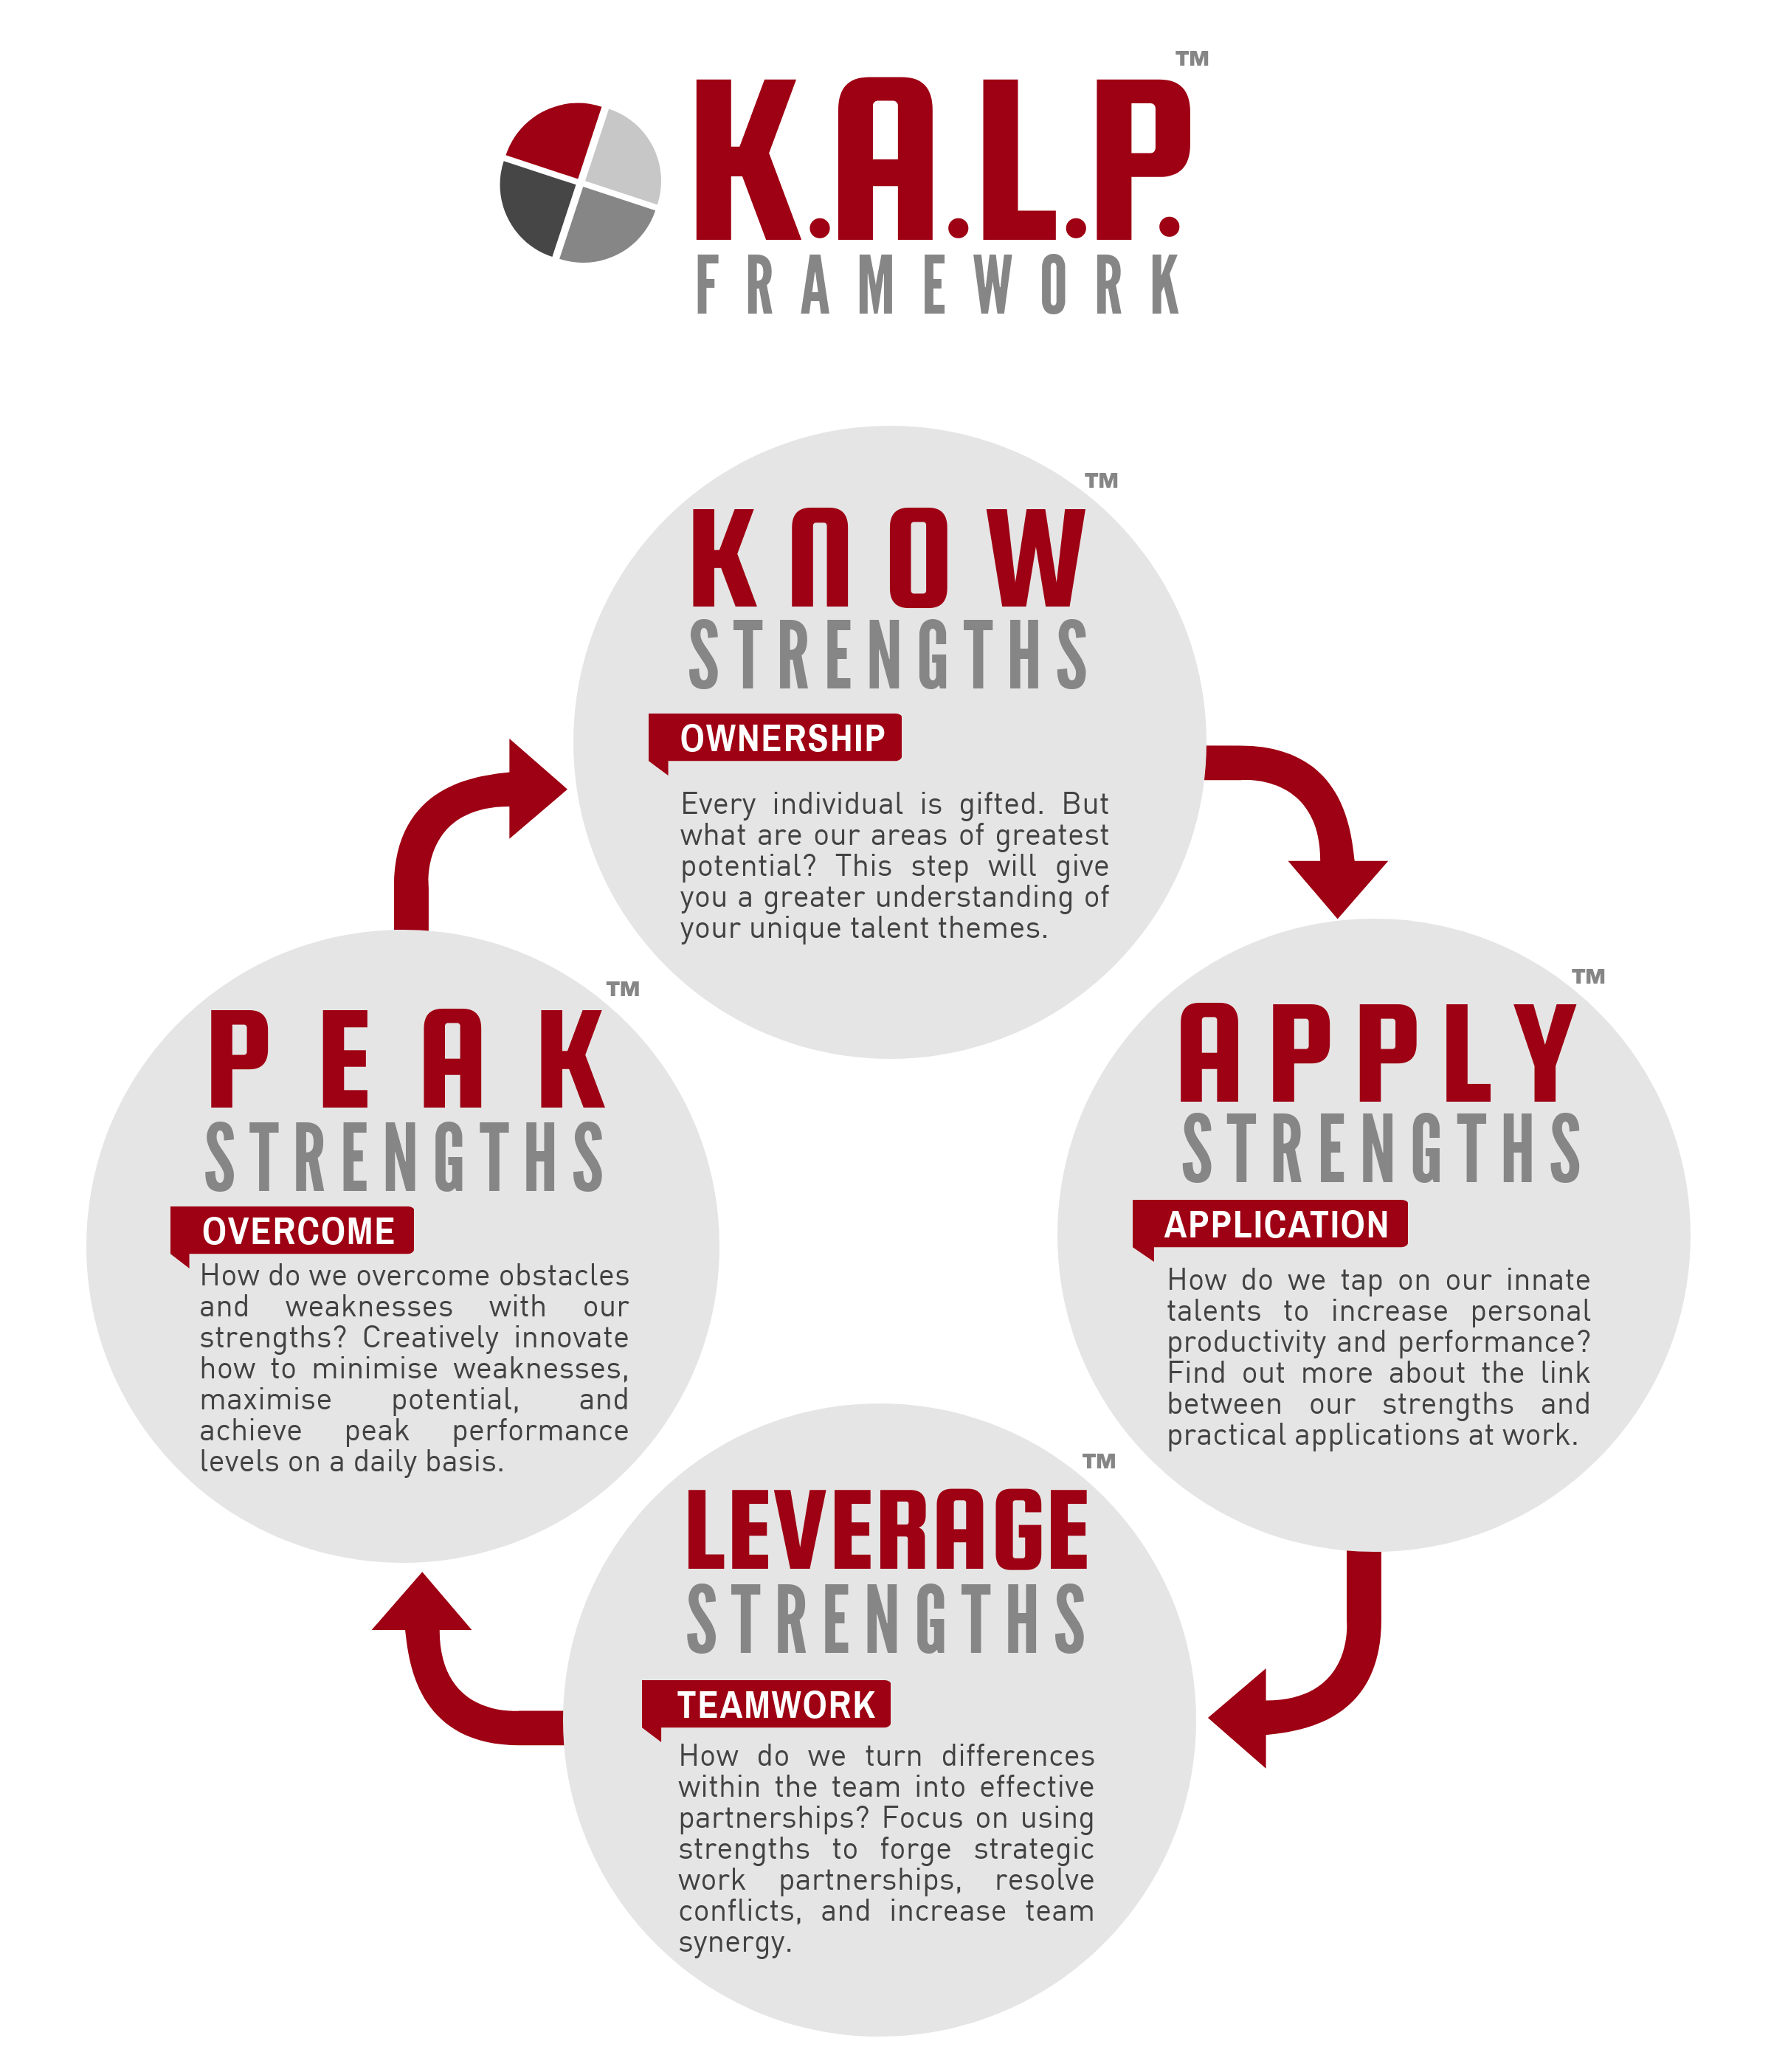 kalp-framework-_29535417.png